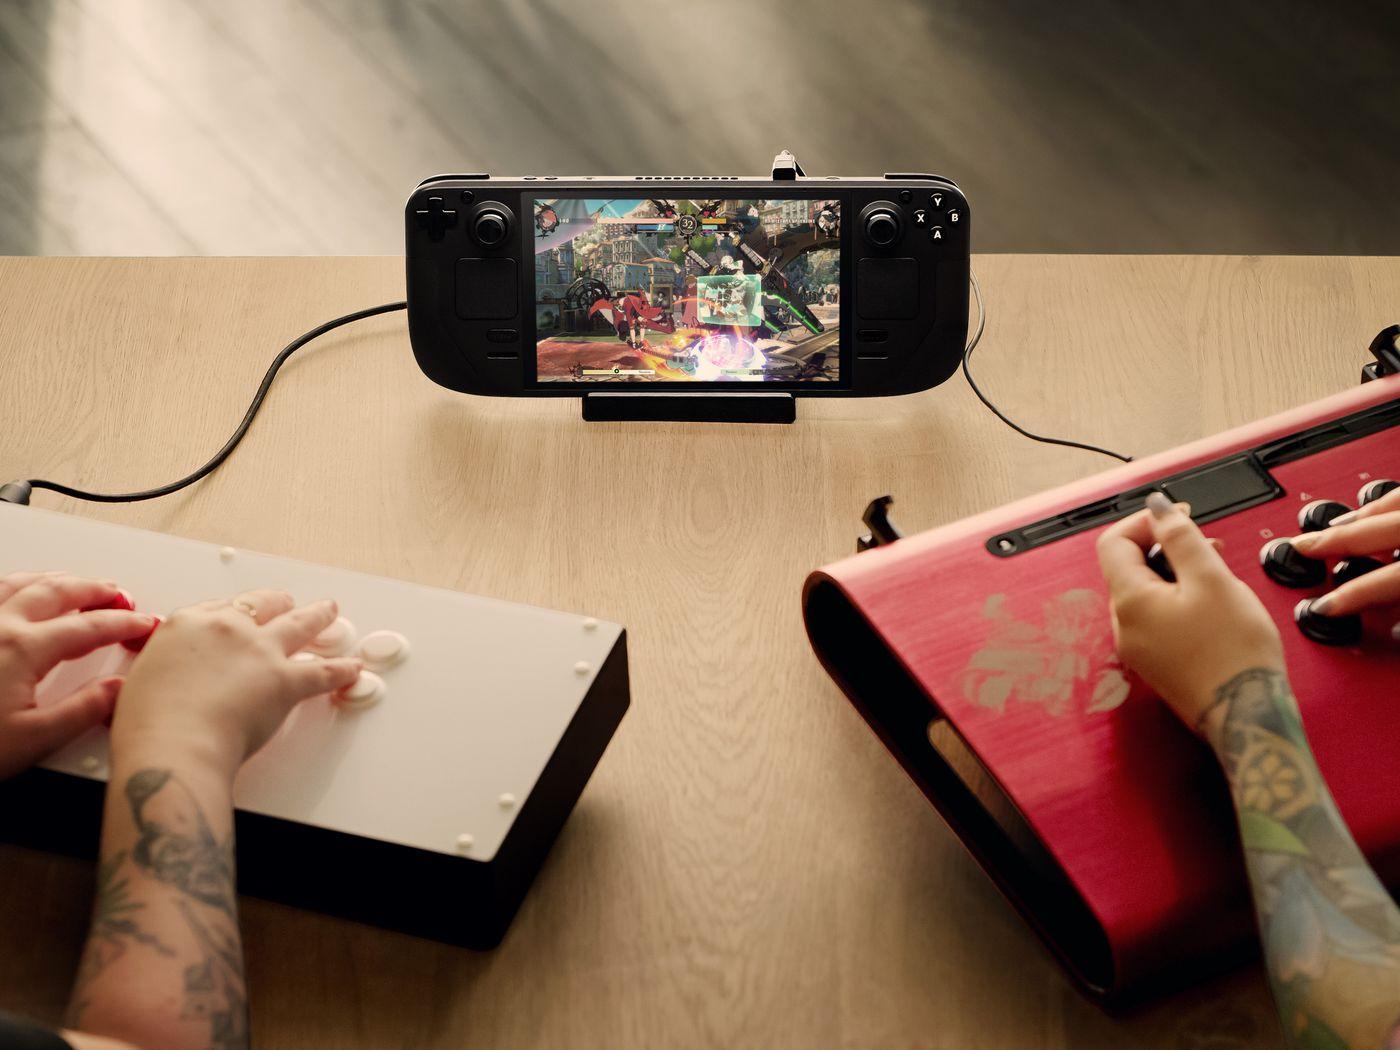 V社:新掌机设计理念与Switch不同 从未做比较